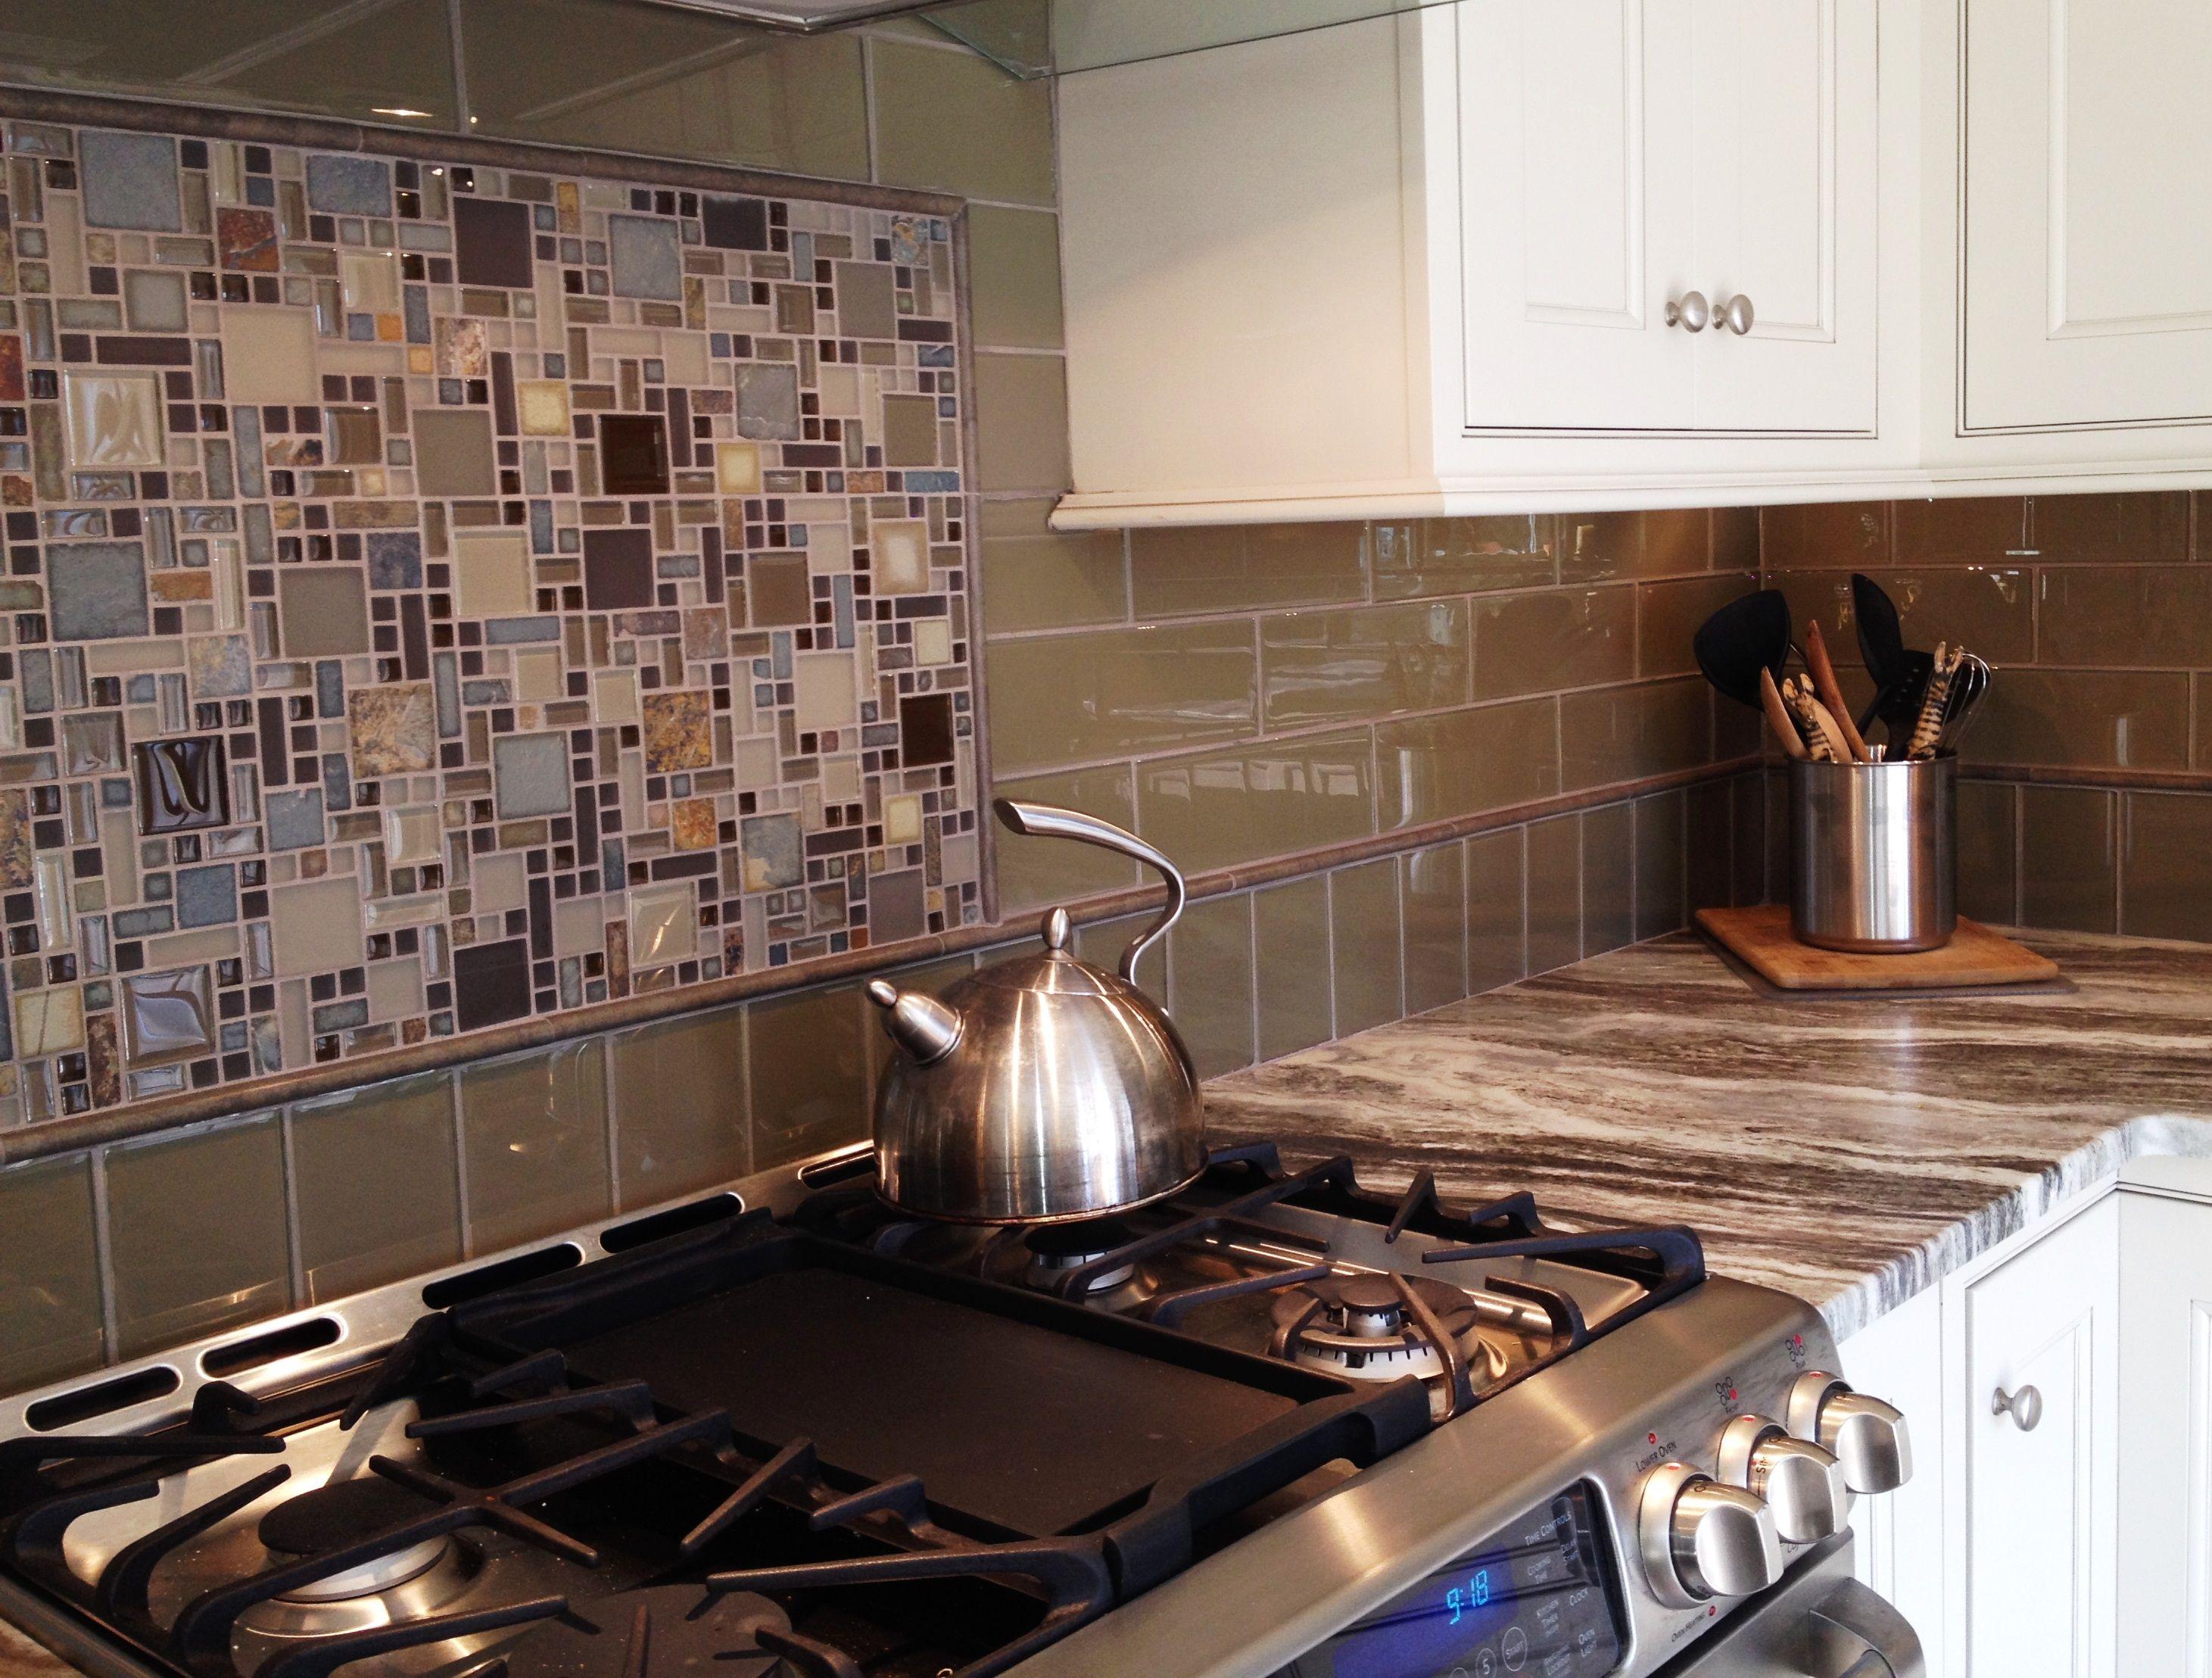 glass tile kitchen countertop bistro table backsplash with framed mosaic insert over